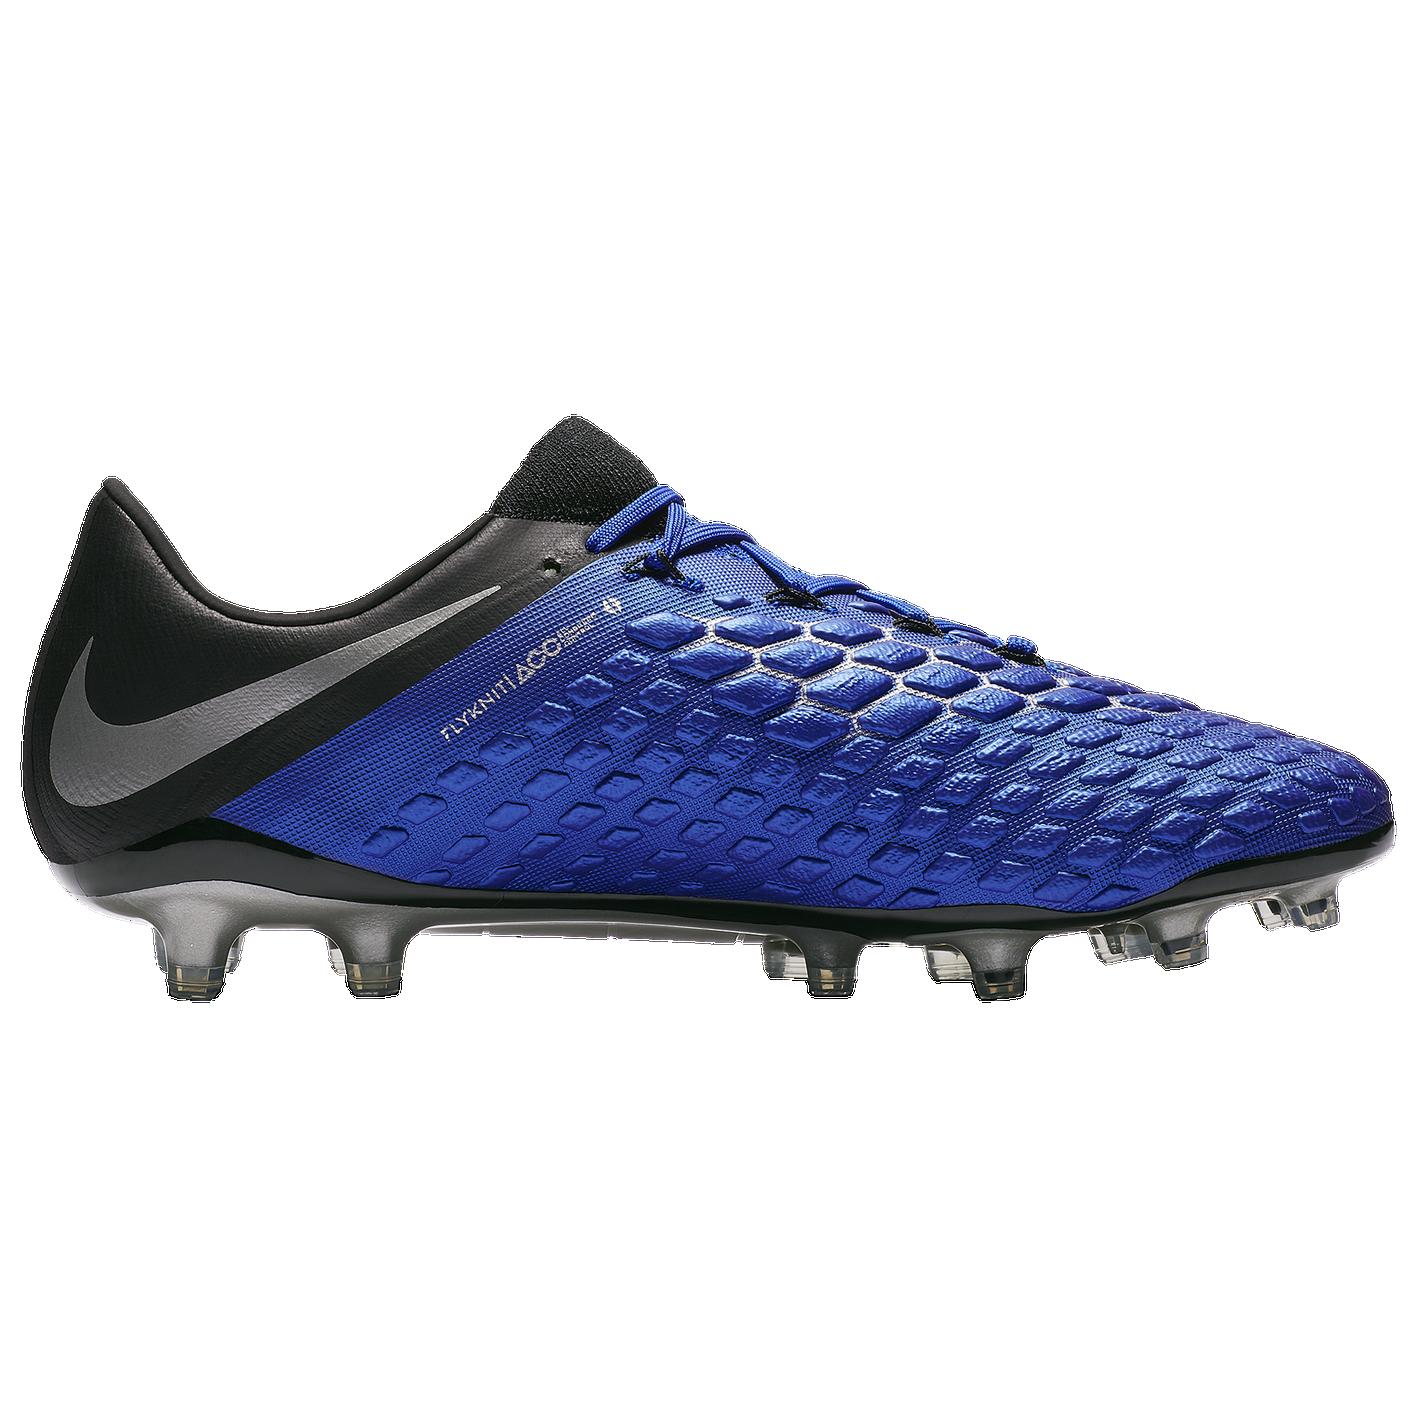 separation shoes 63237 b47bc Nike Hypervenom Phantom 3 Elite FG - Men s